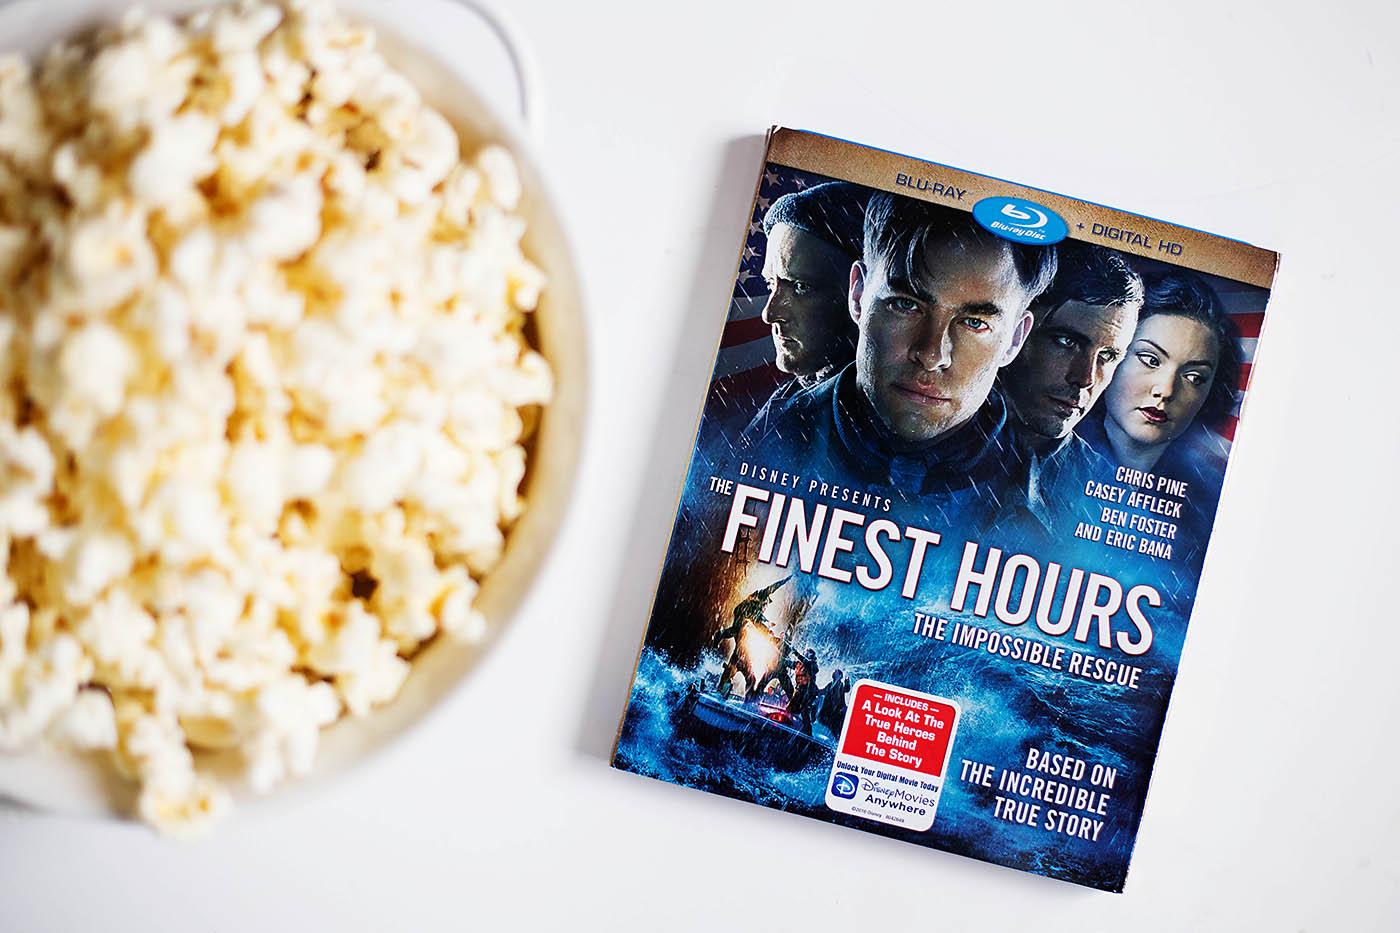 Movie Night Fun - Finest Hours